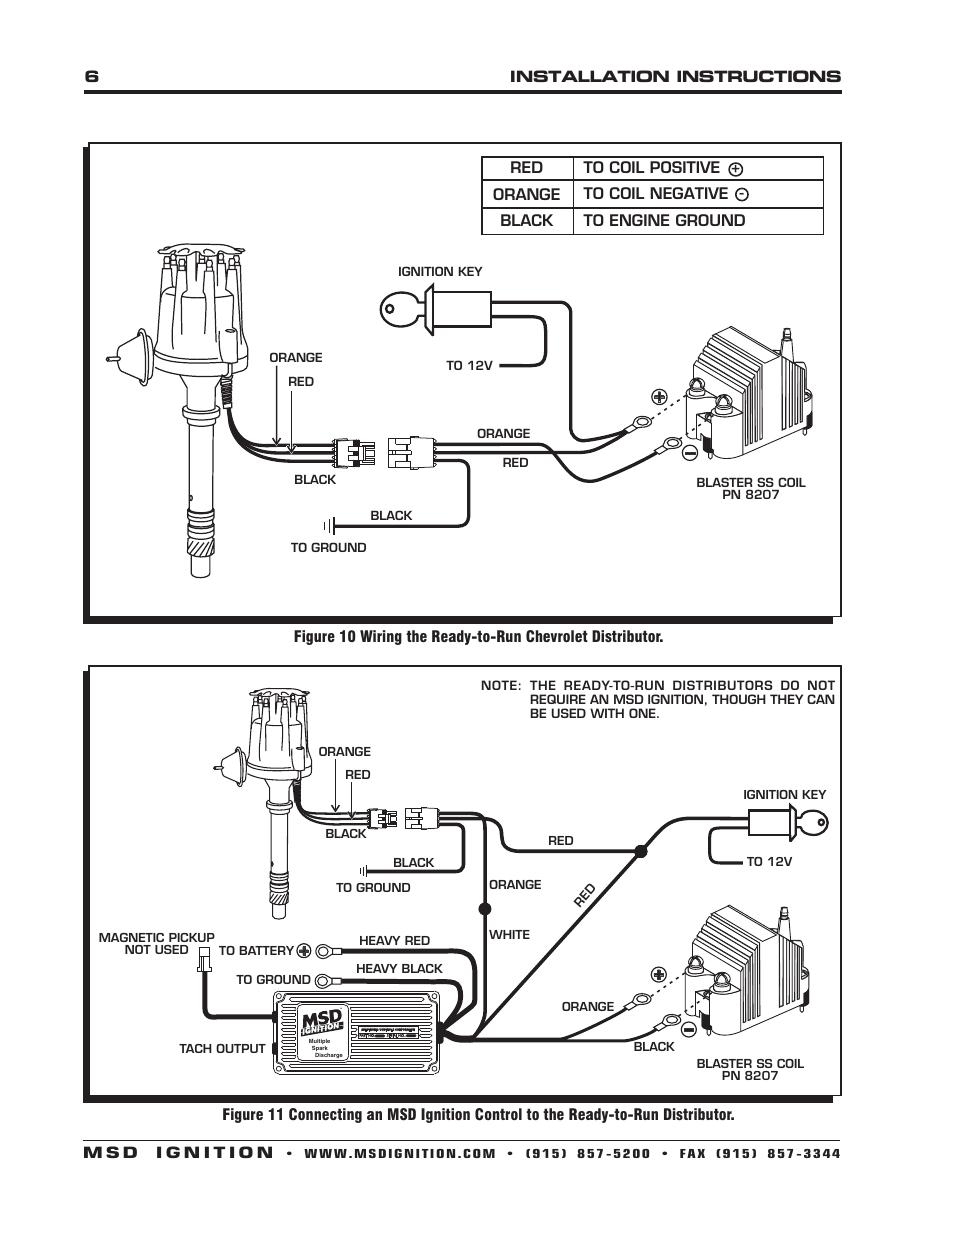 5462 To Hei Distributor Manual Guide